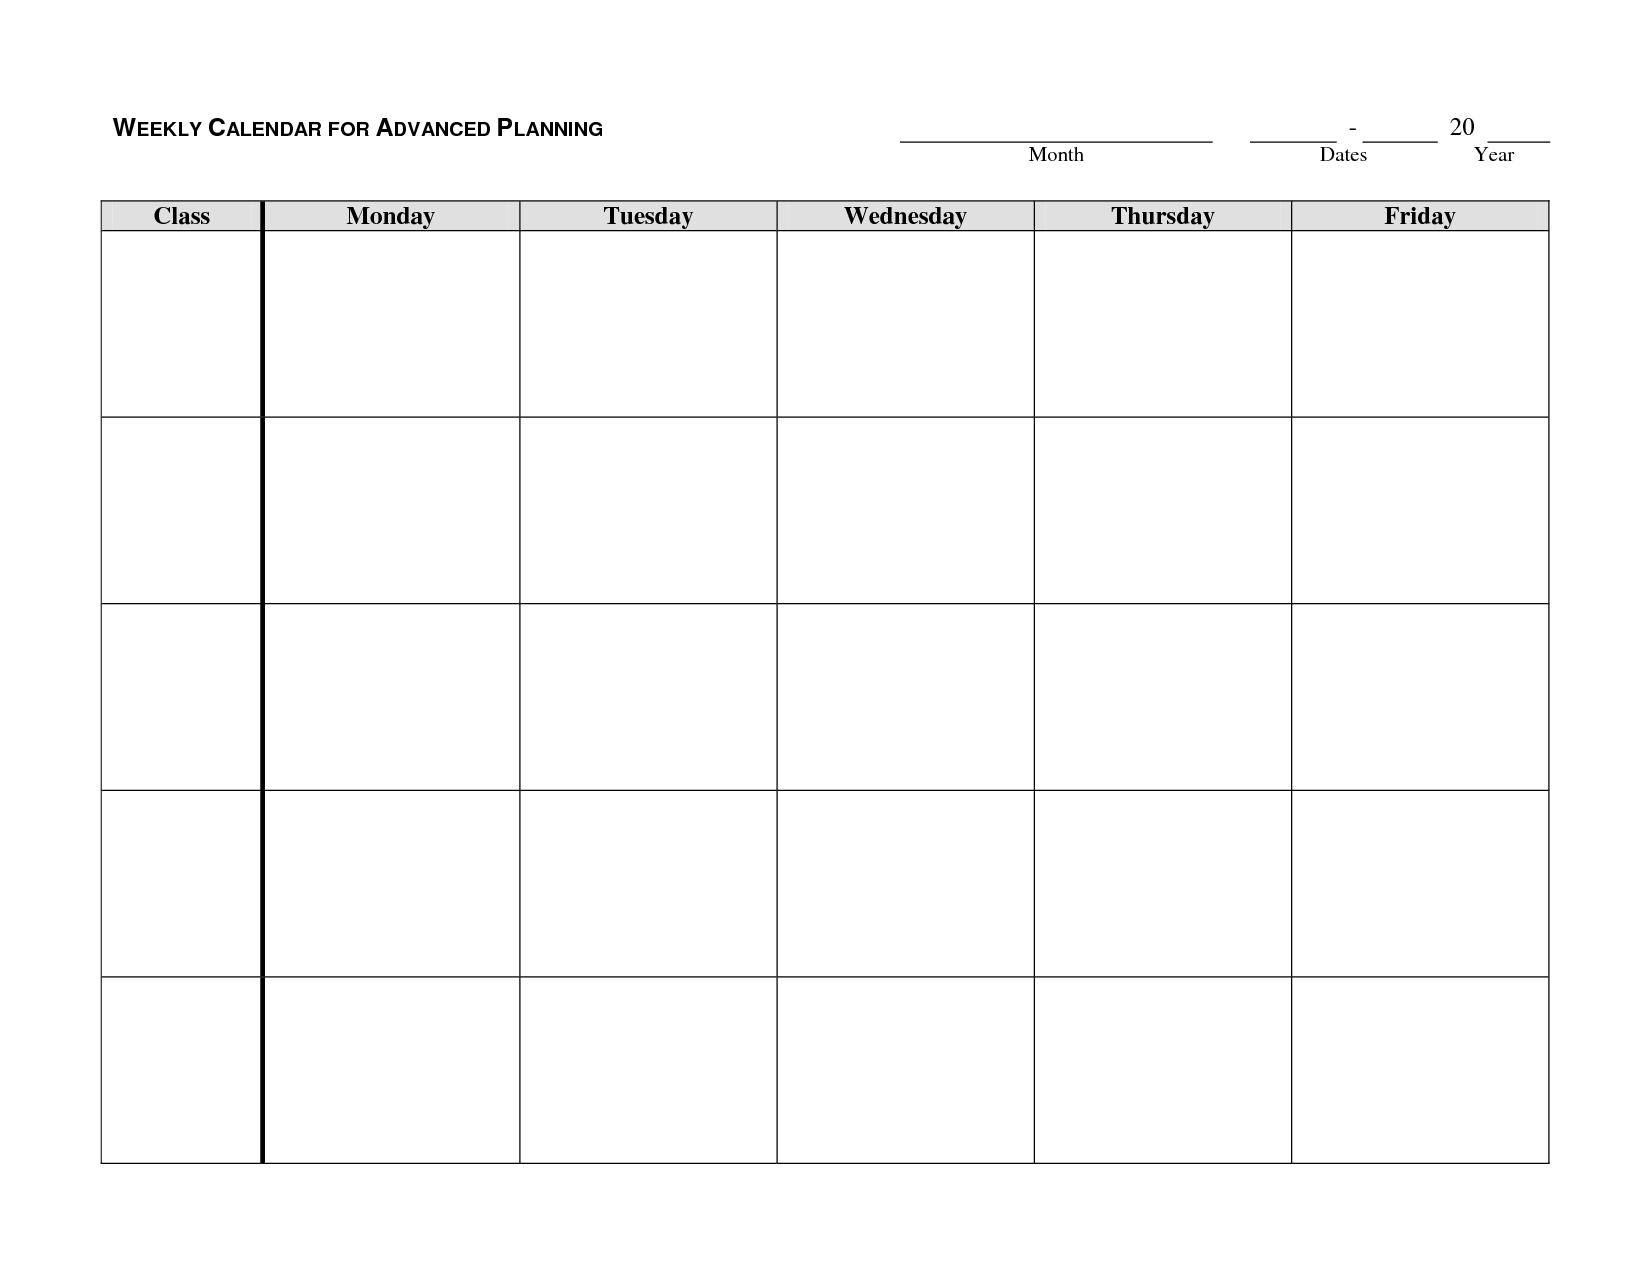 Monday Through Friday Blank Schedule Print Out - Calendar Printable Monday To Friday Calendar